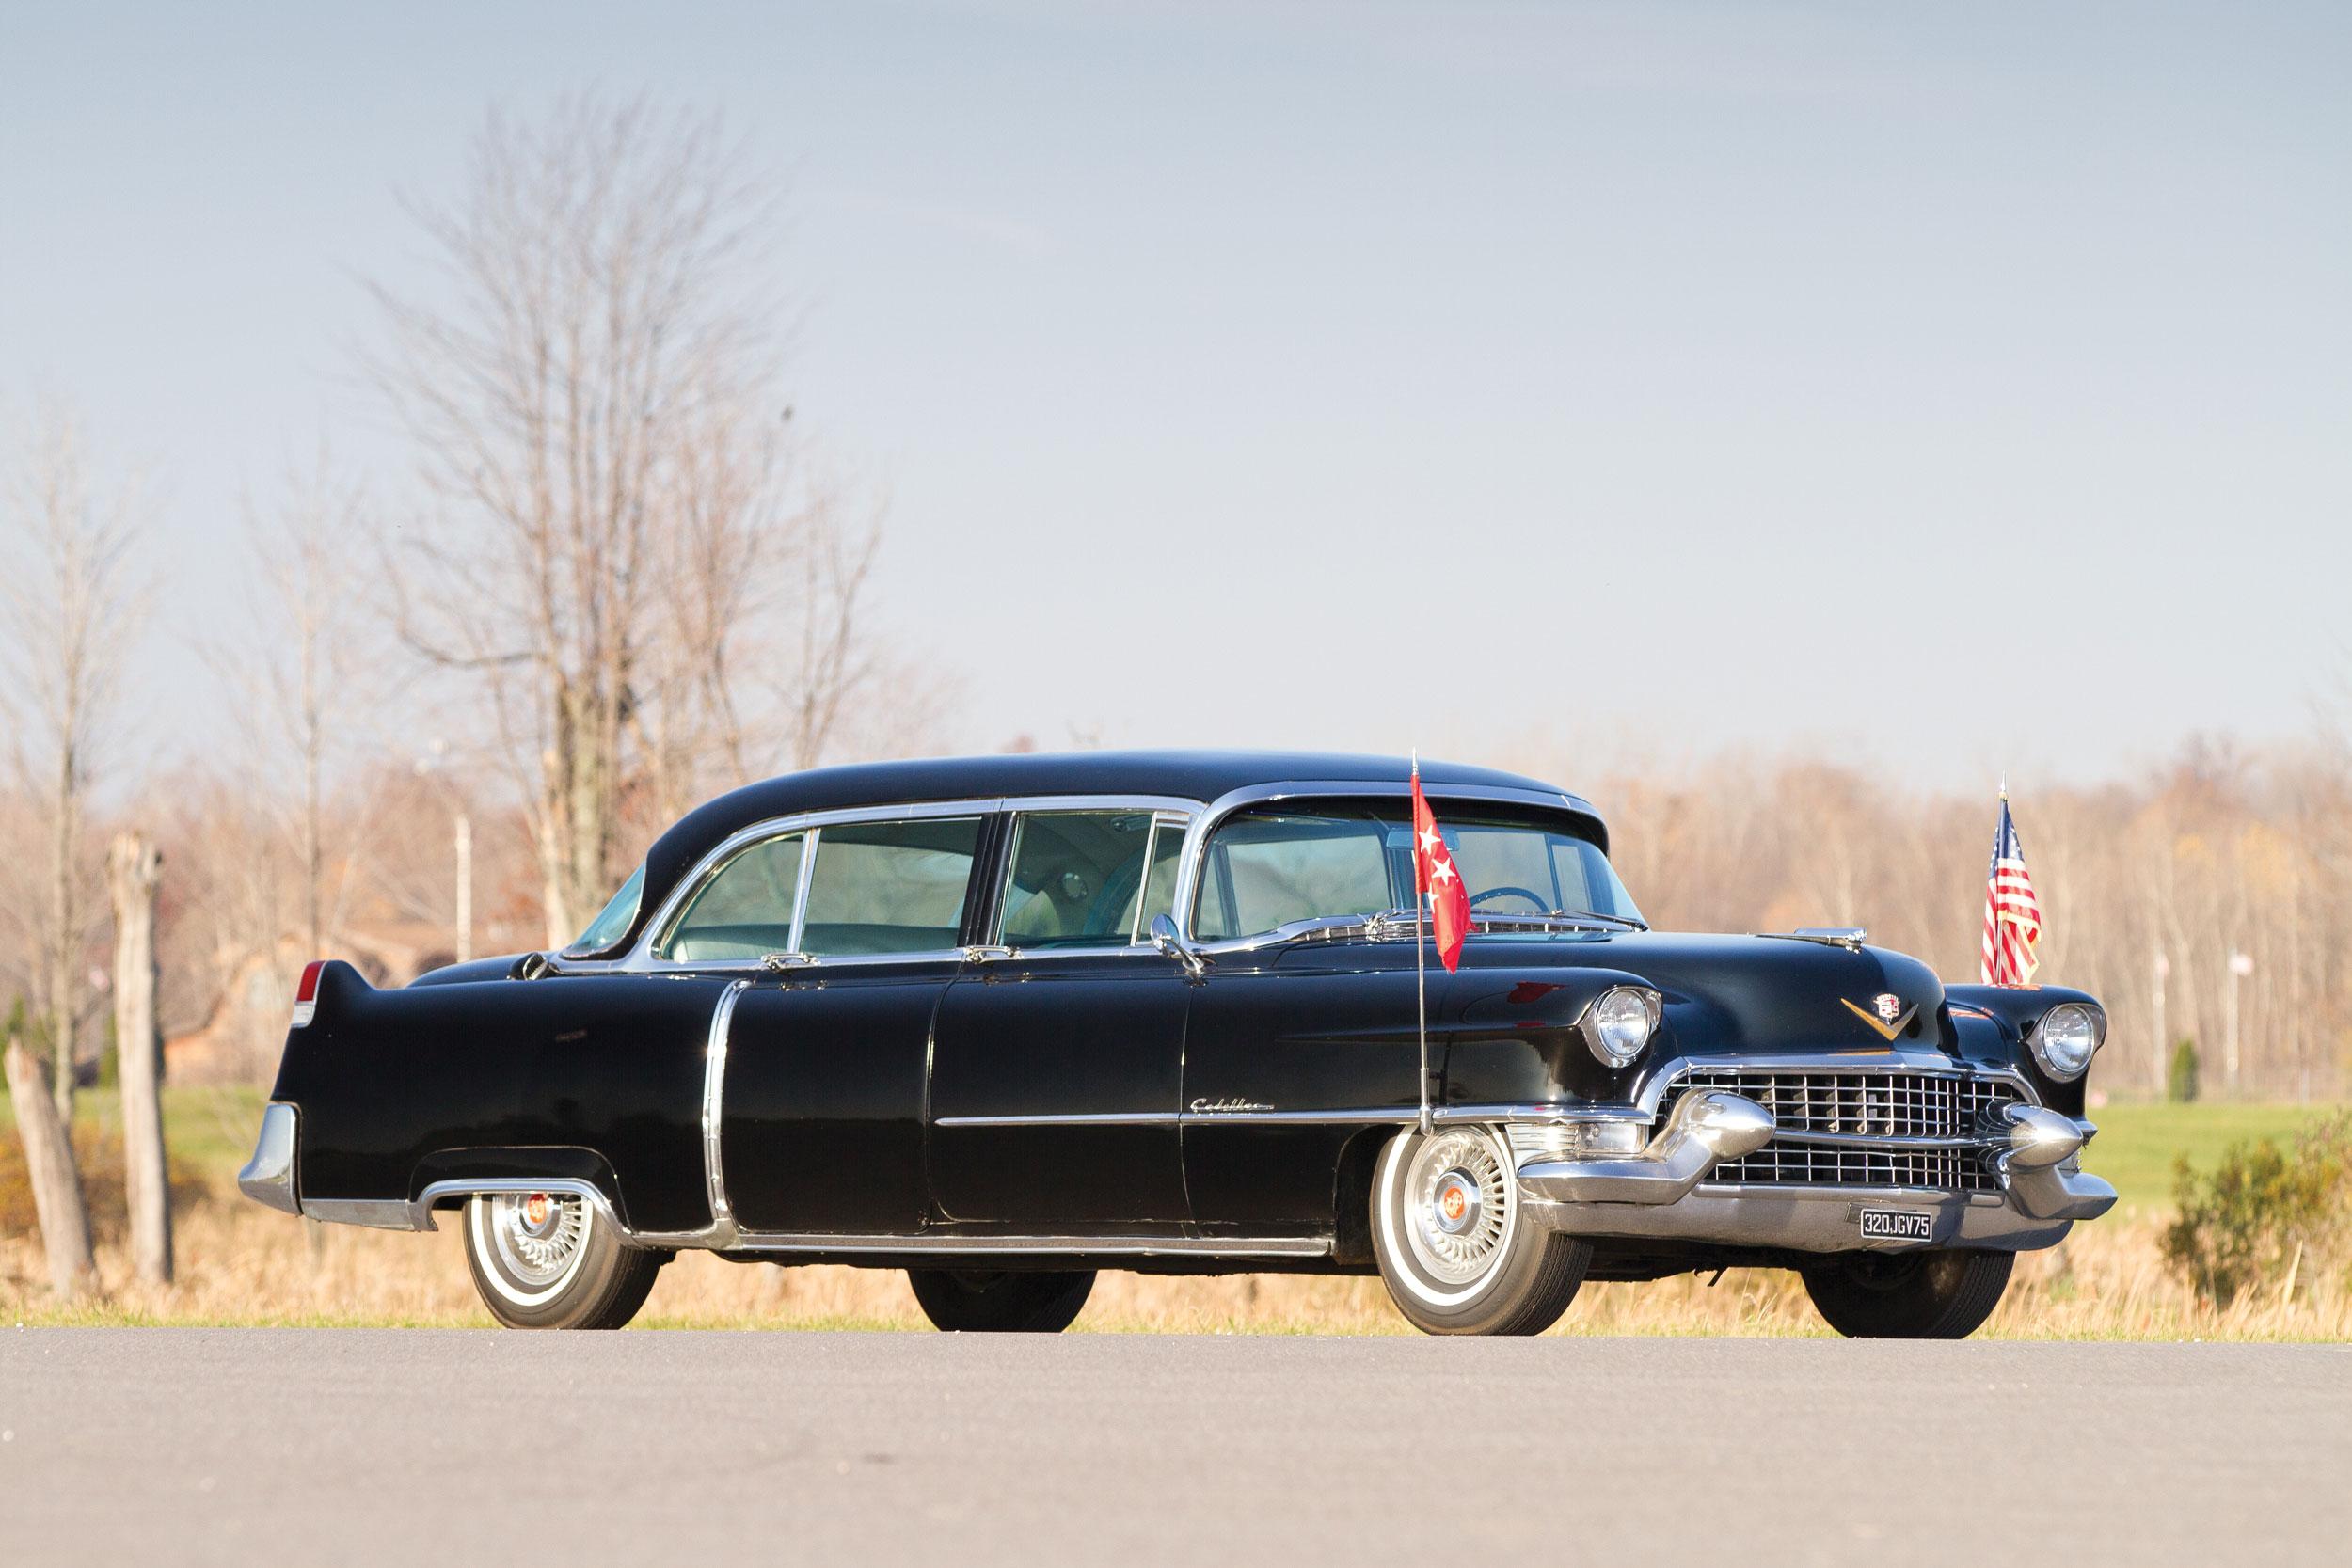 1955 Cadillac Series 75 Presidential Parade Limousine